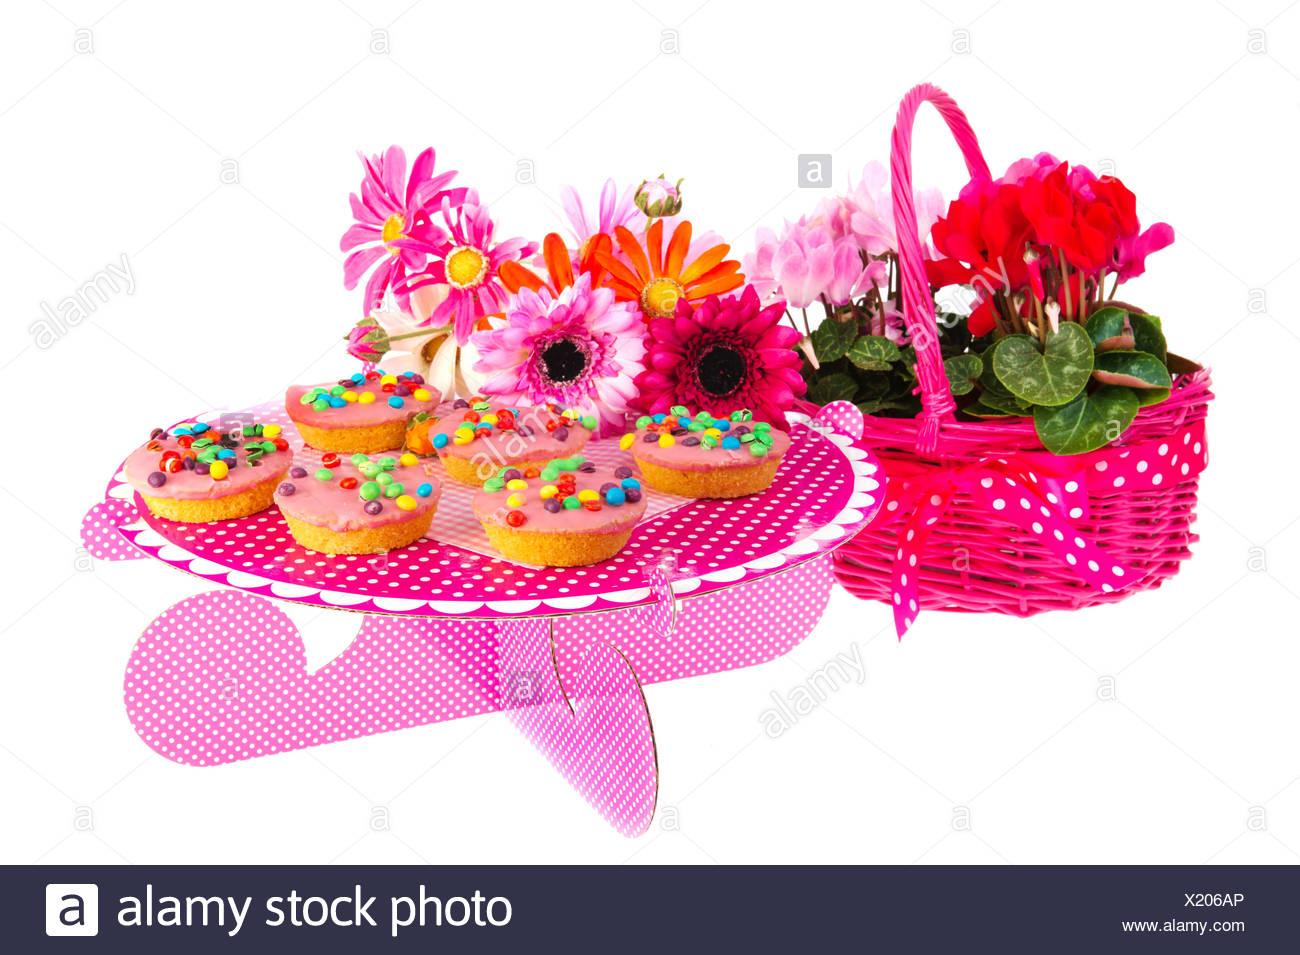 Surprising Birthday Cakes And Flowers Stock Photo 276600206 Alamy Birthday Cards Printable Opercafe Filternl